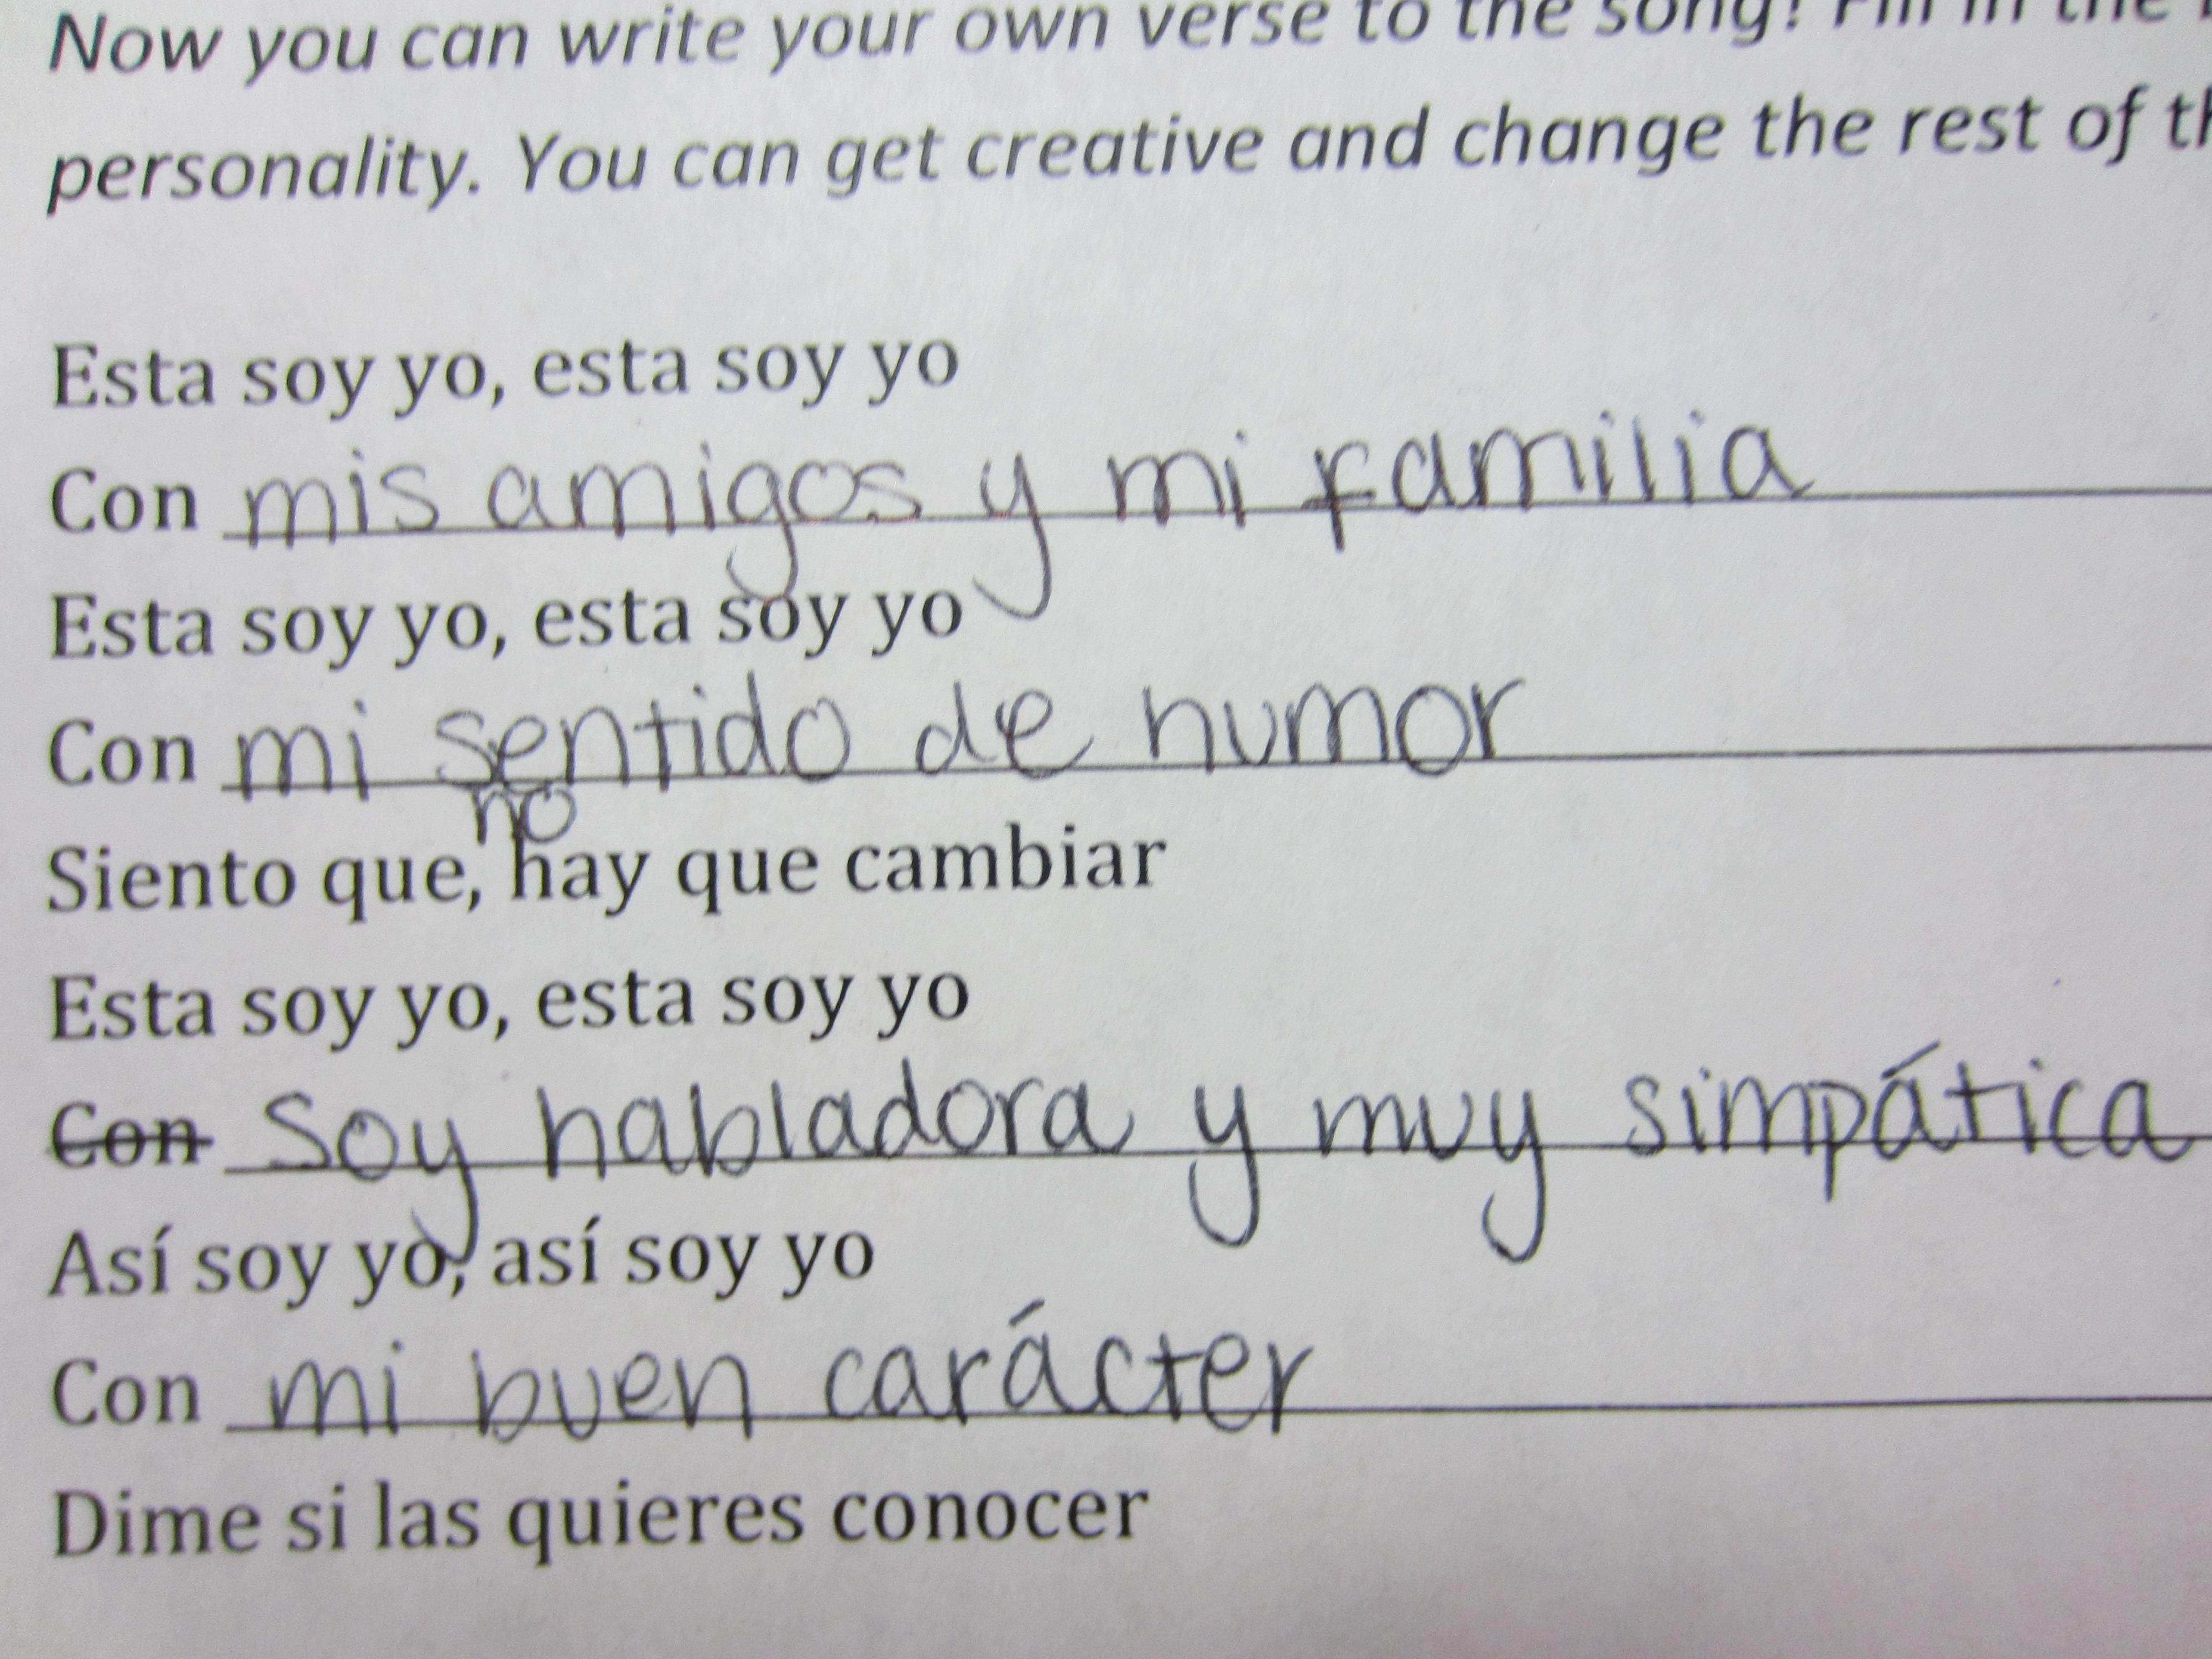 Best Francisca Valenzuela Esta Soy Yo Lyrics In English Image Collection Apexi Vafc2 Wiring Diagram Comprtelo